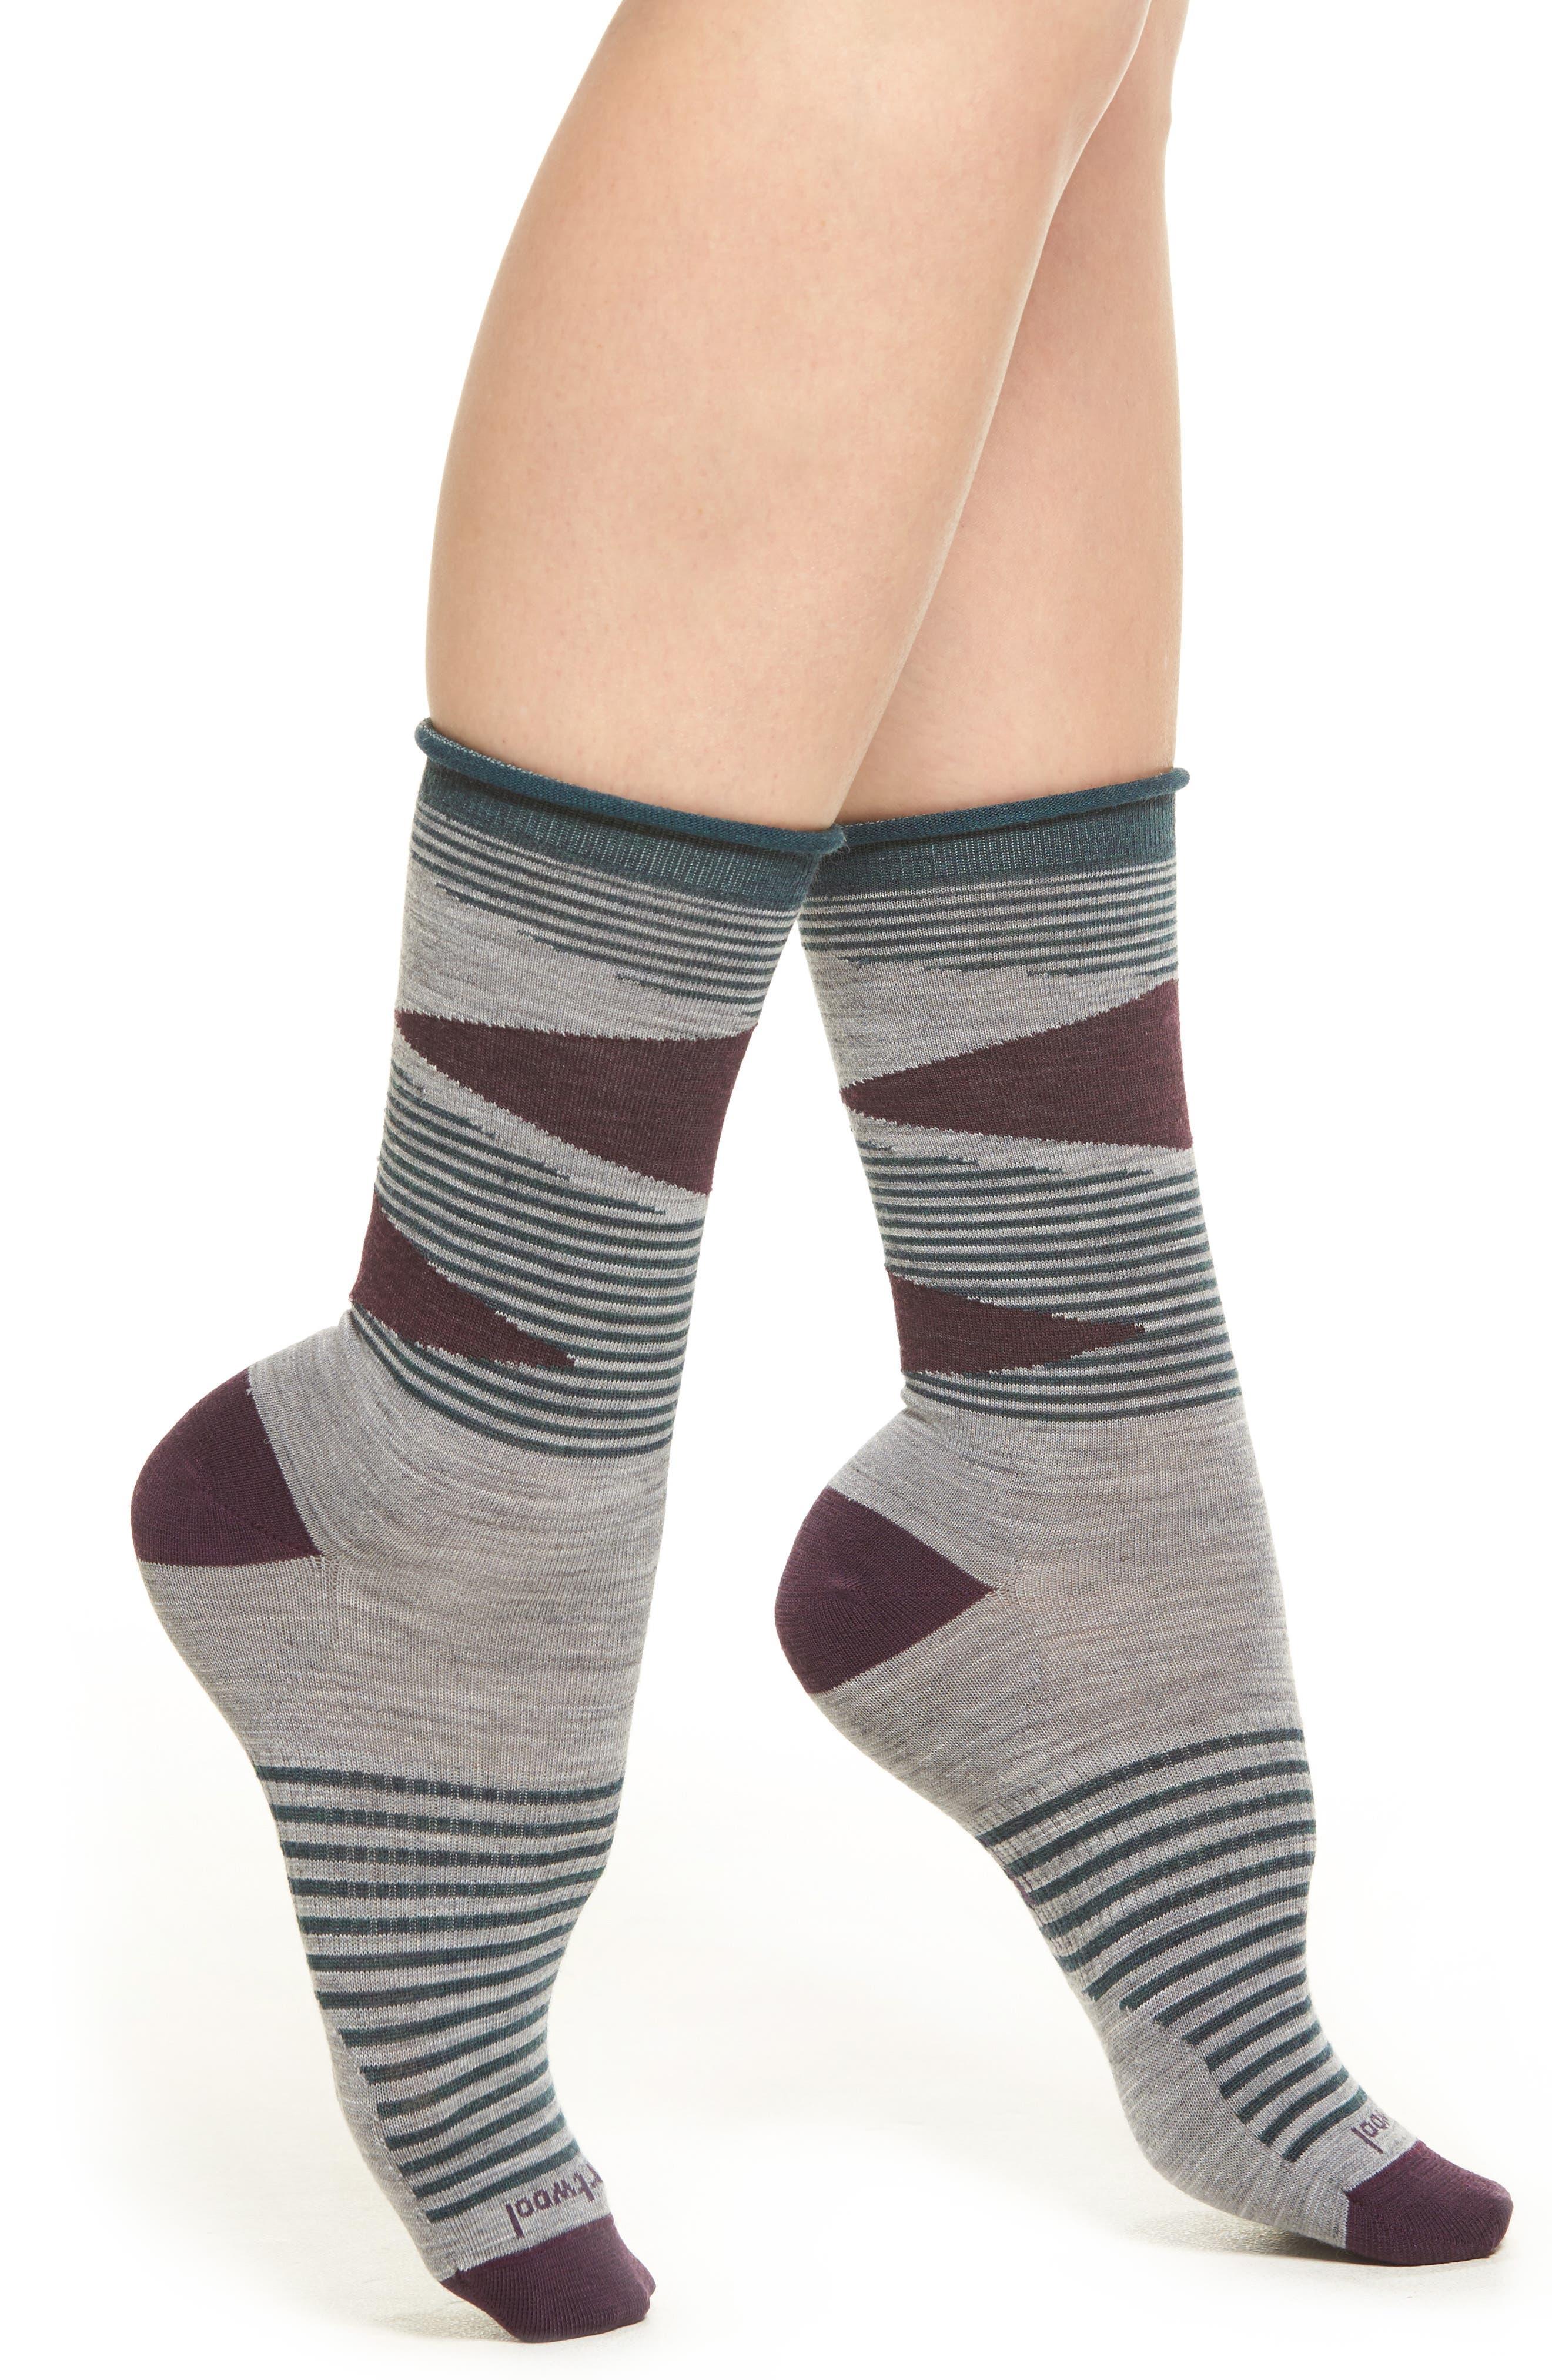 First Mate Crew Socks,                         Main,                         color, 050